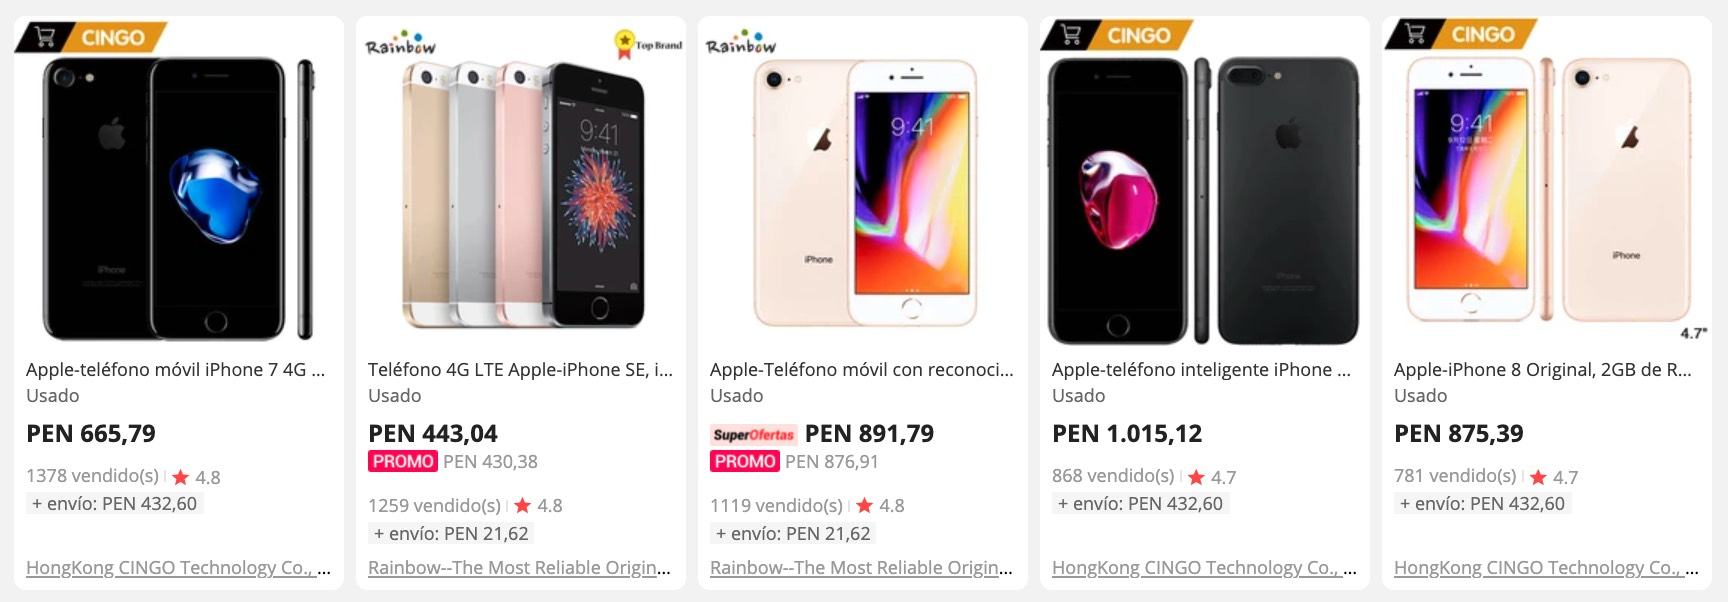 iphone aliexpress